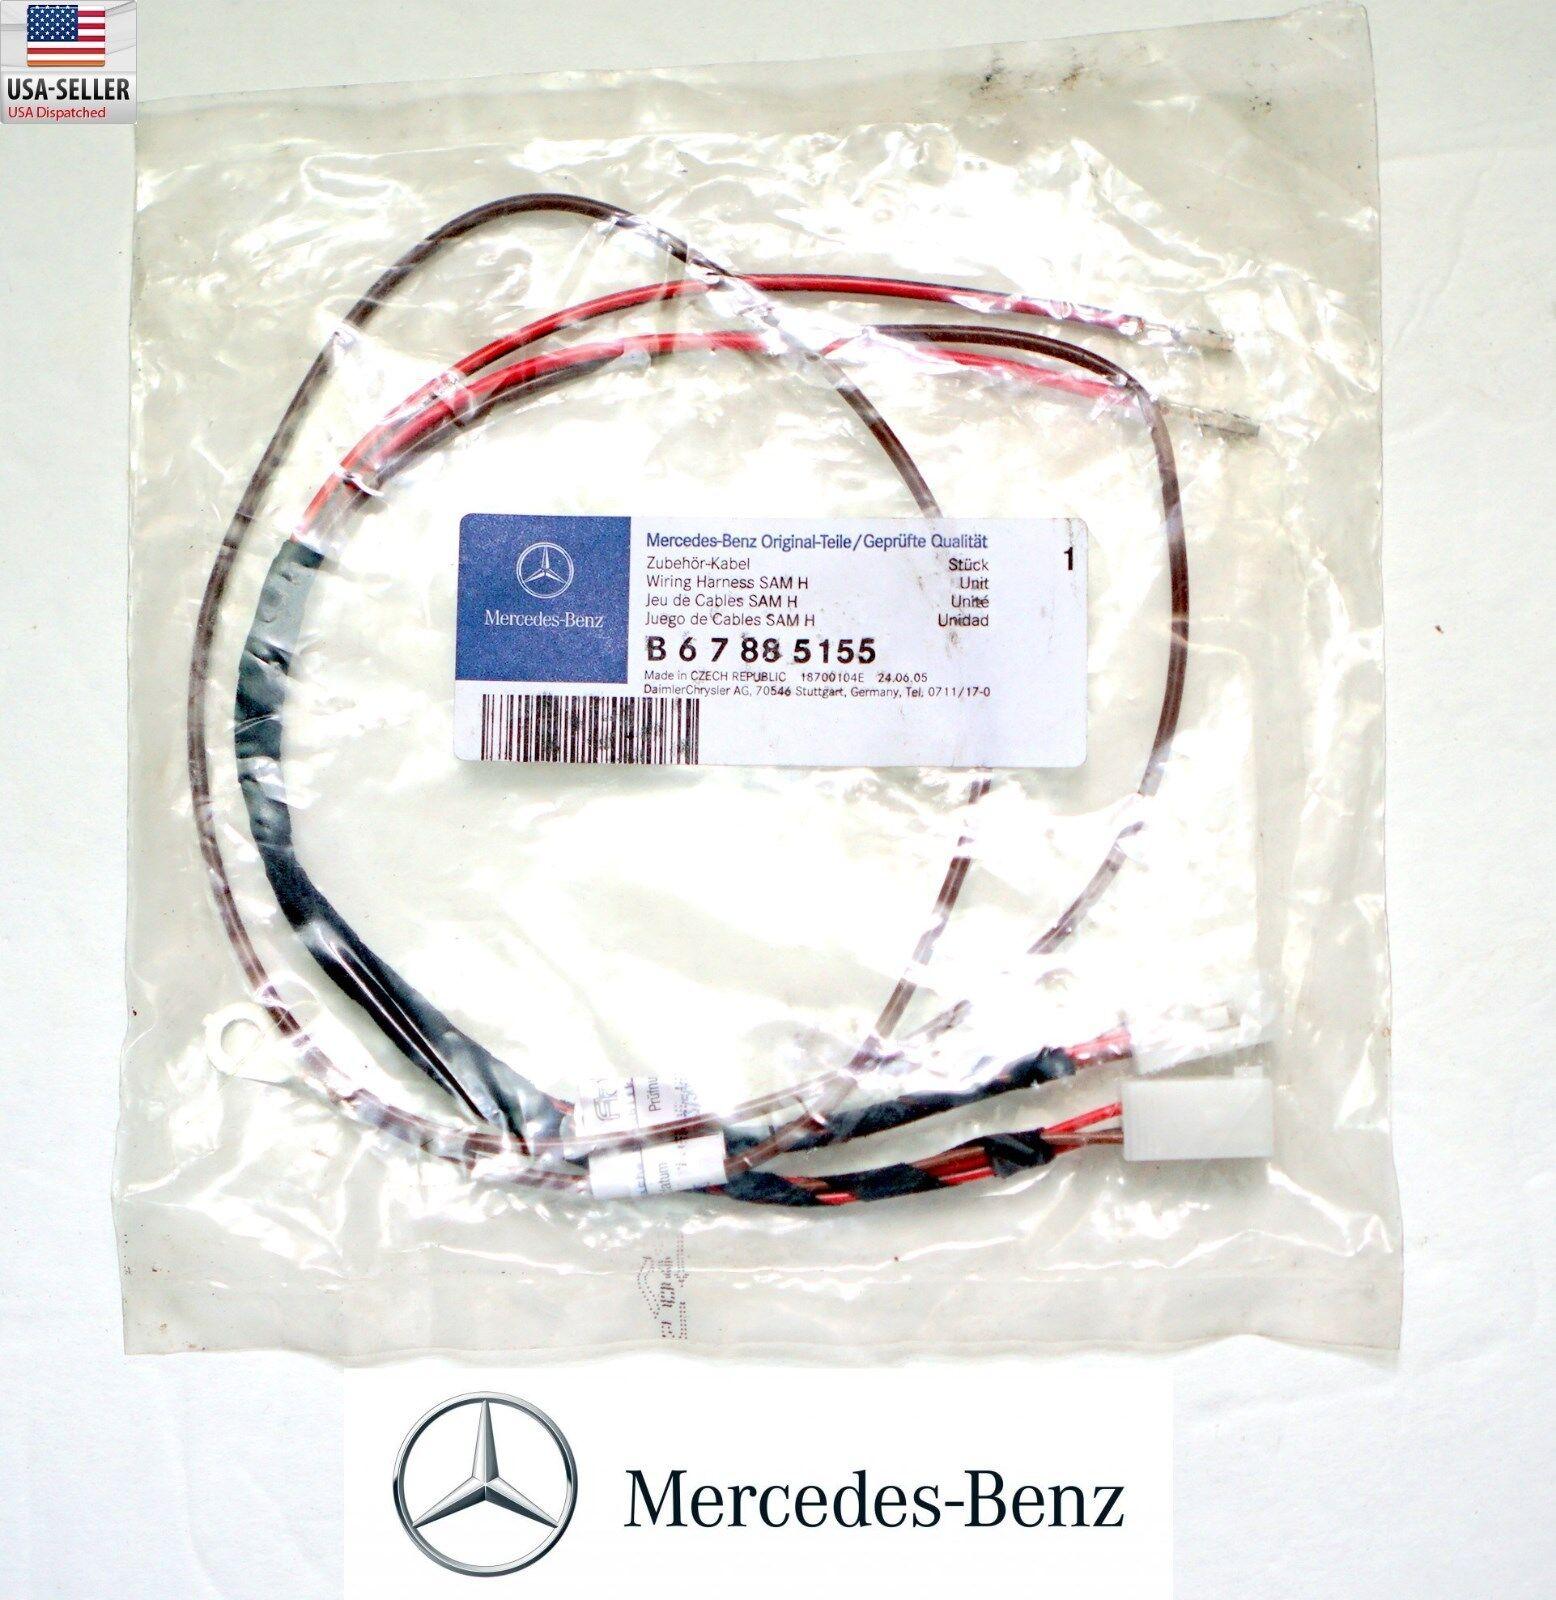 Mercedes B67885155 Sam H Wiring Harness Bluetooth Ebay Ats Norton Secured Powered By Verisign